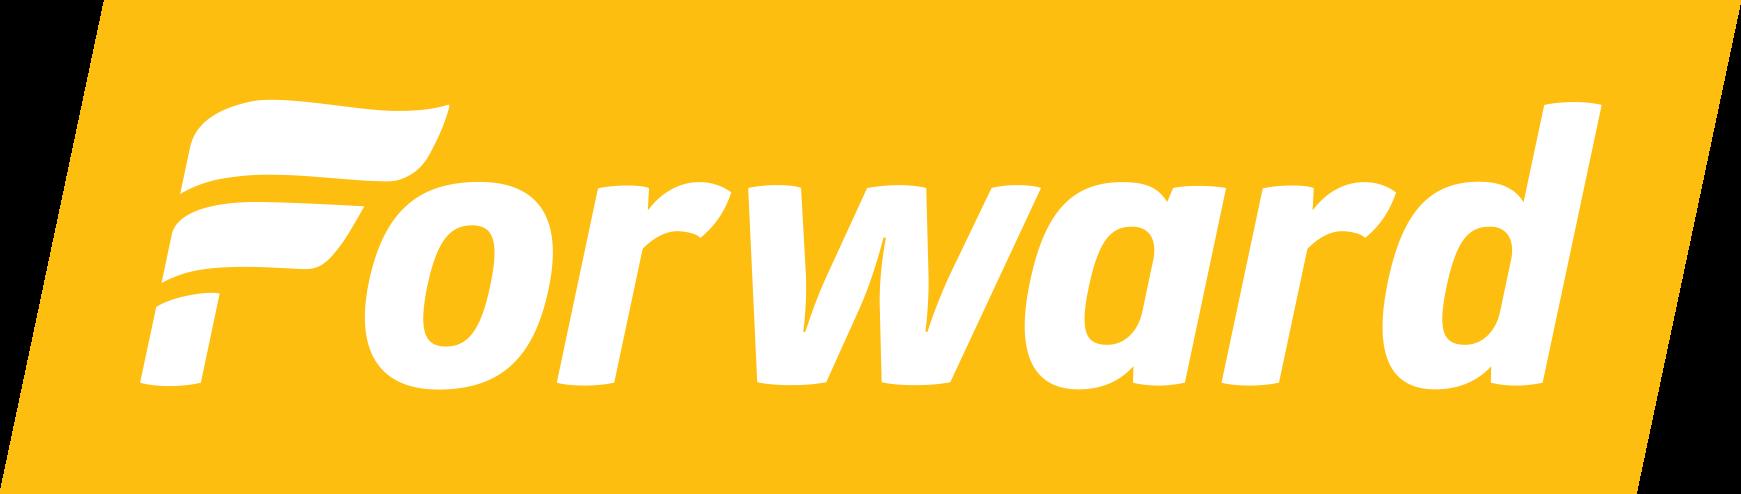 Forward_PrimaryLogo_CMYK (4).png